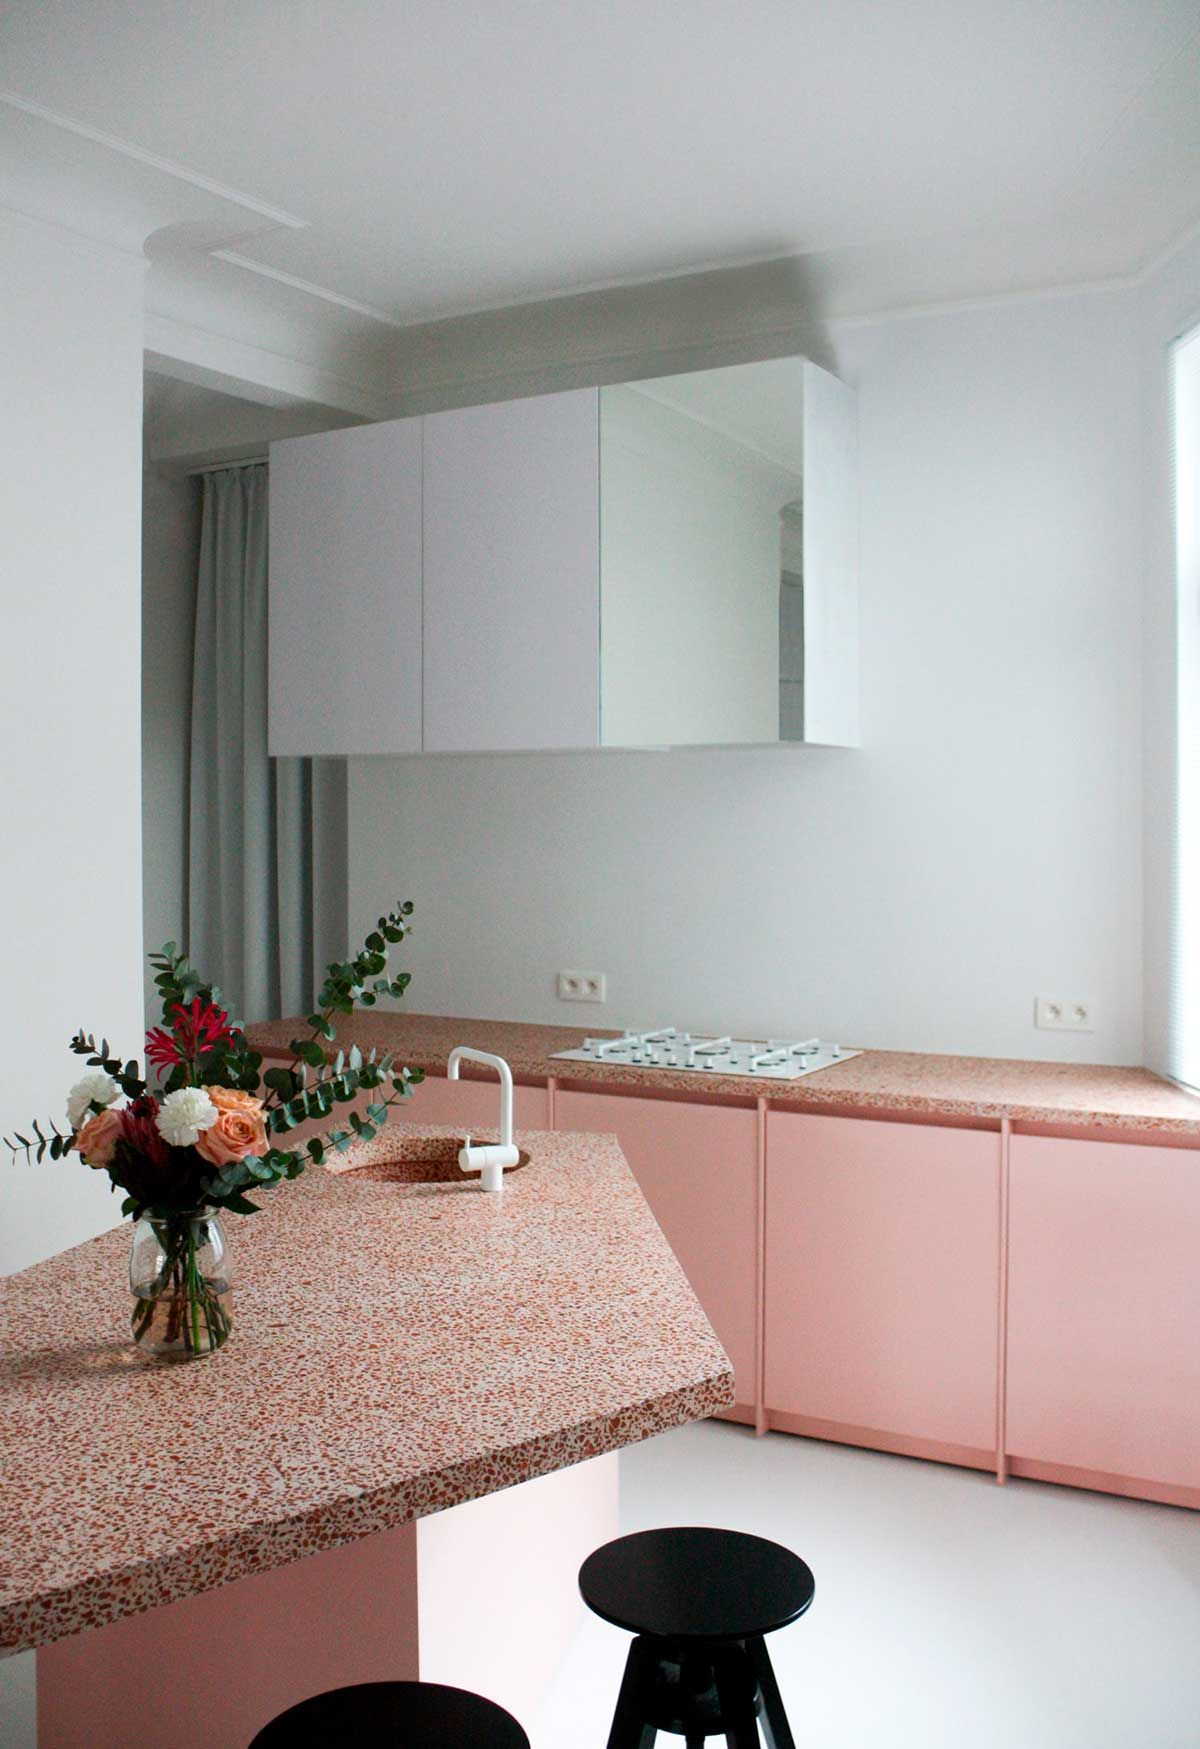 Granilite E Marmorite O Que S O E Quando Funcionam Kitchen